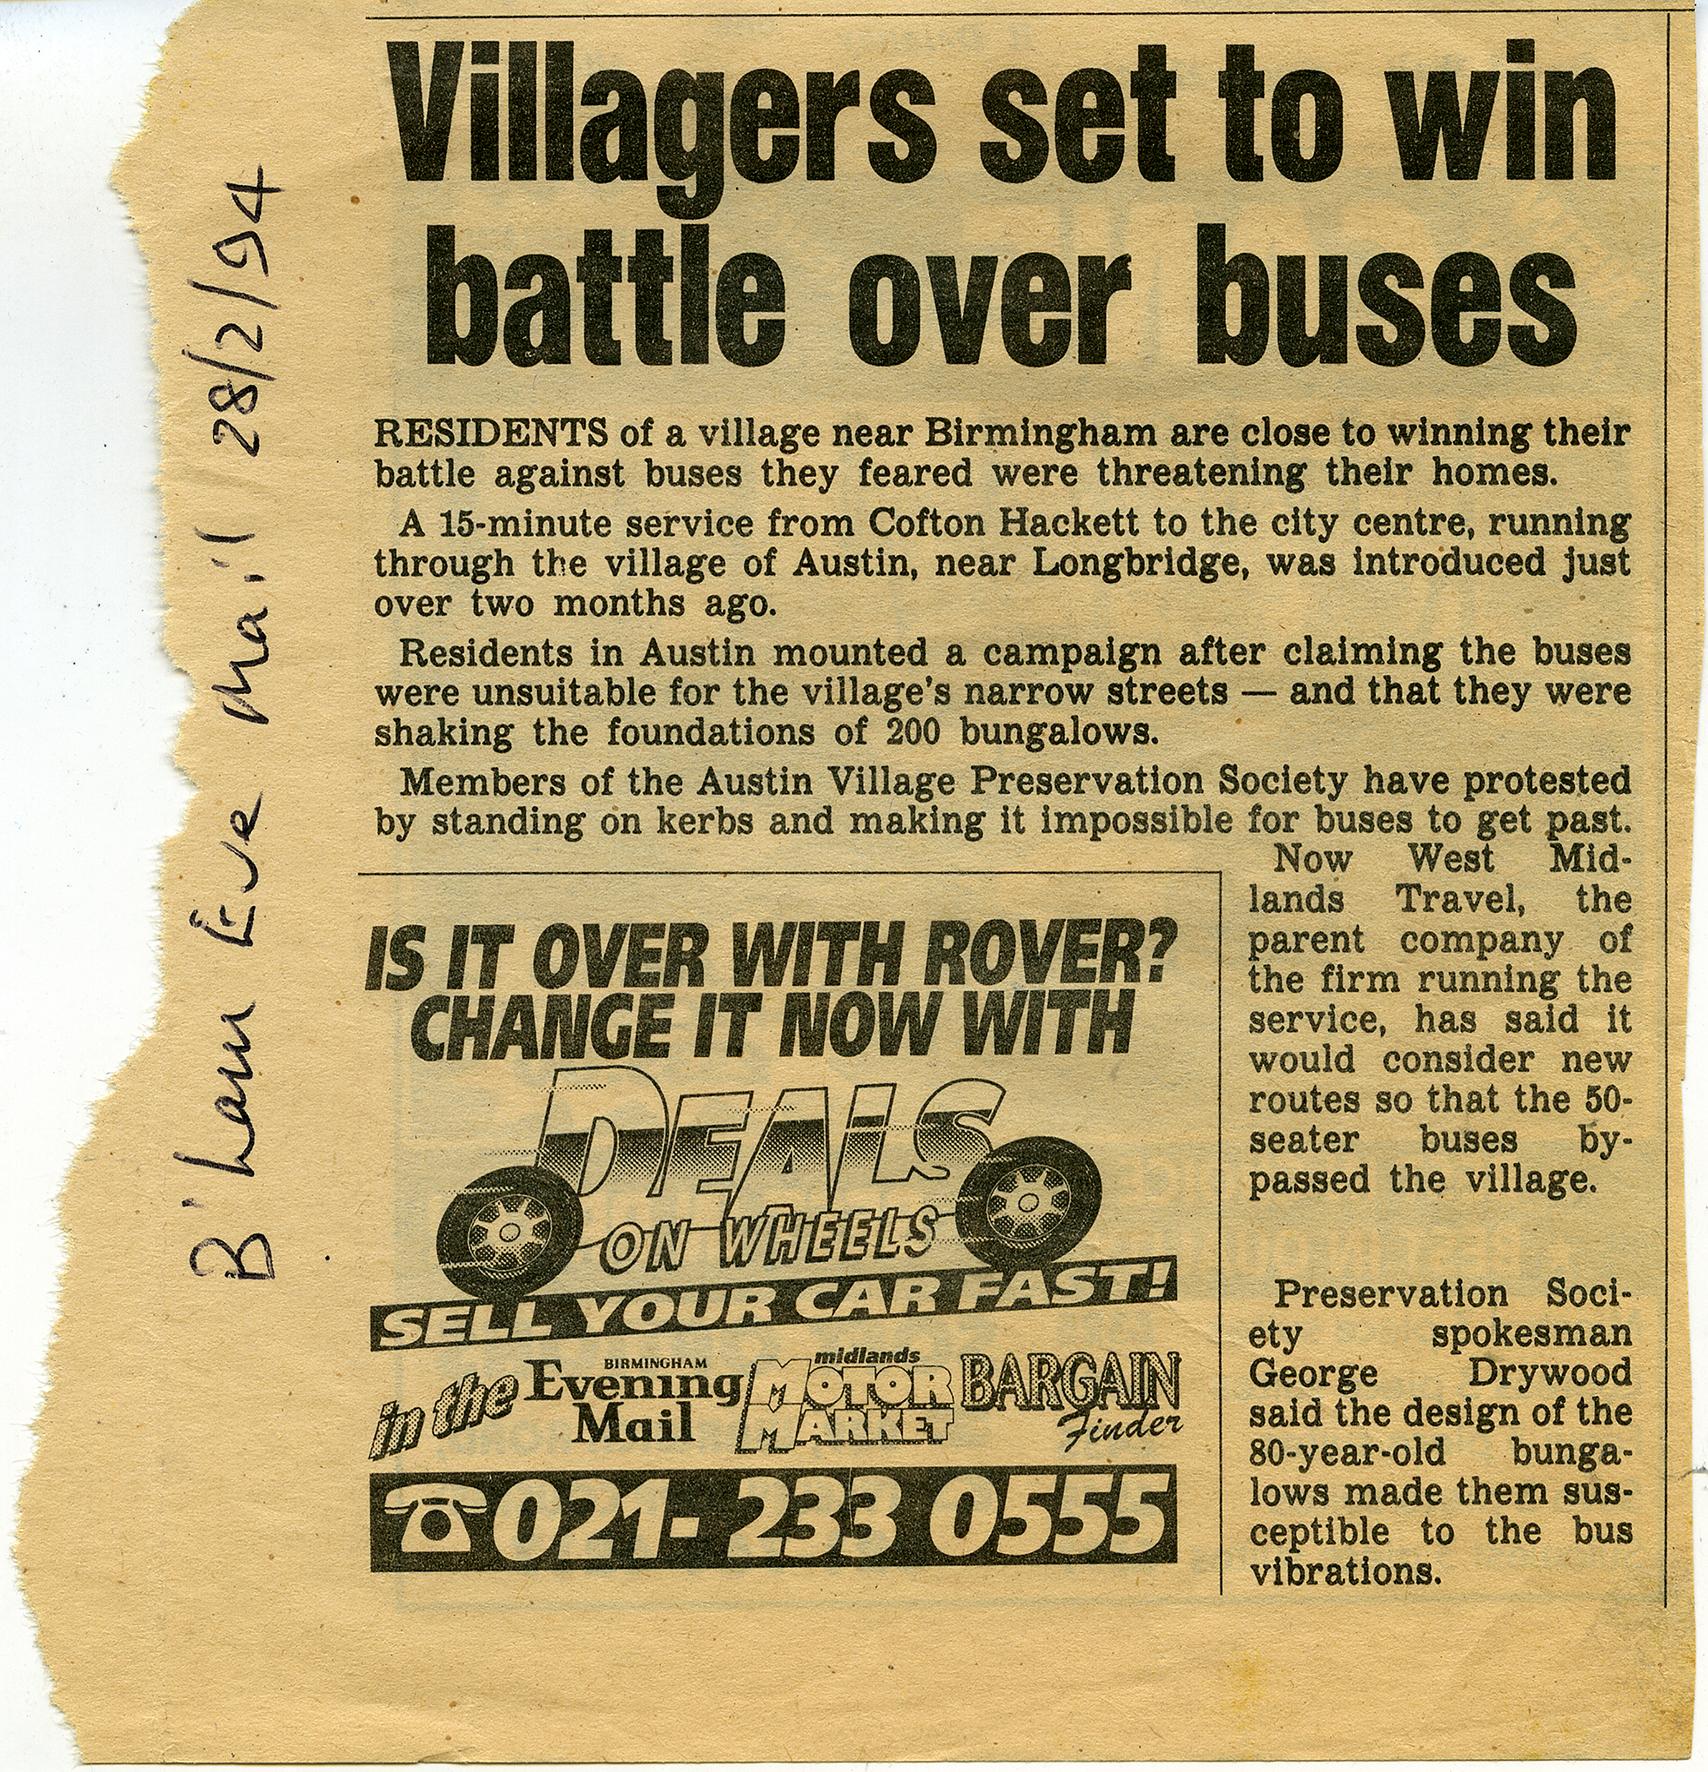 Evening Mail_February 1994_2.jpg